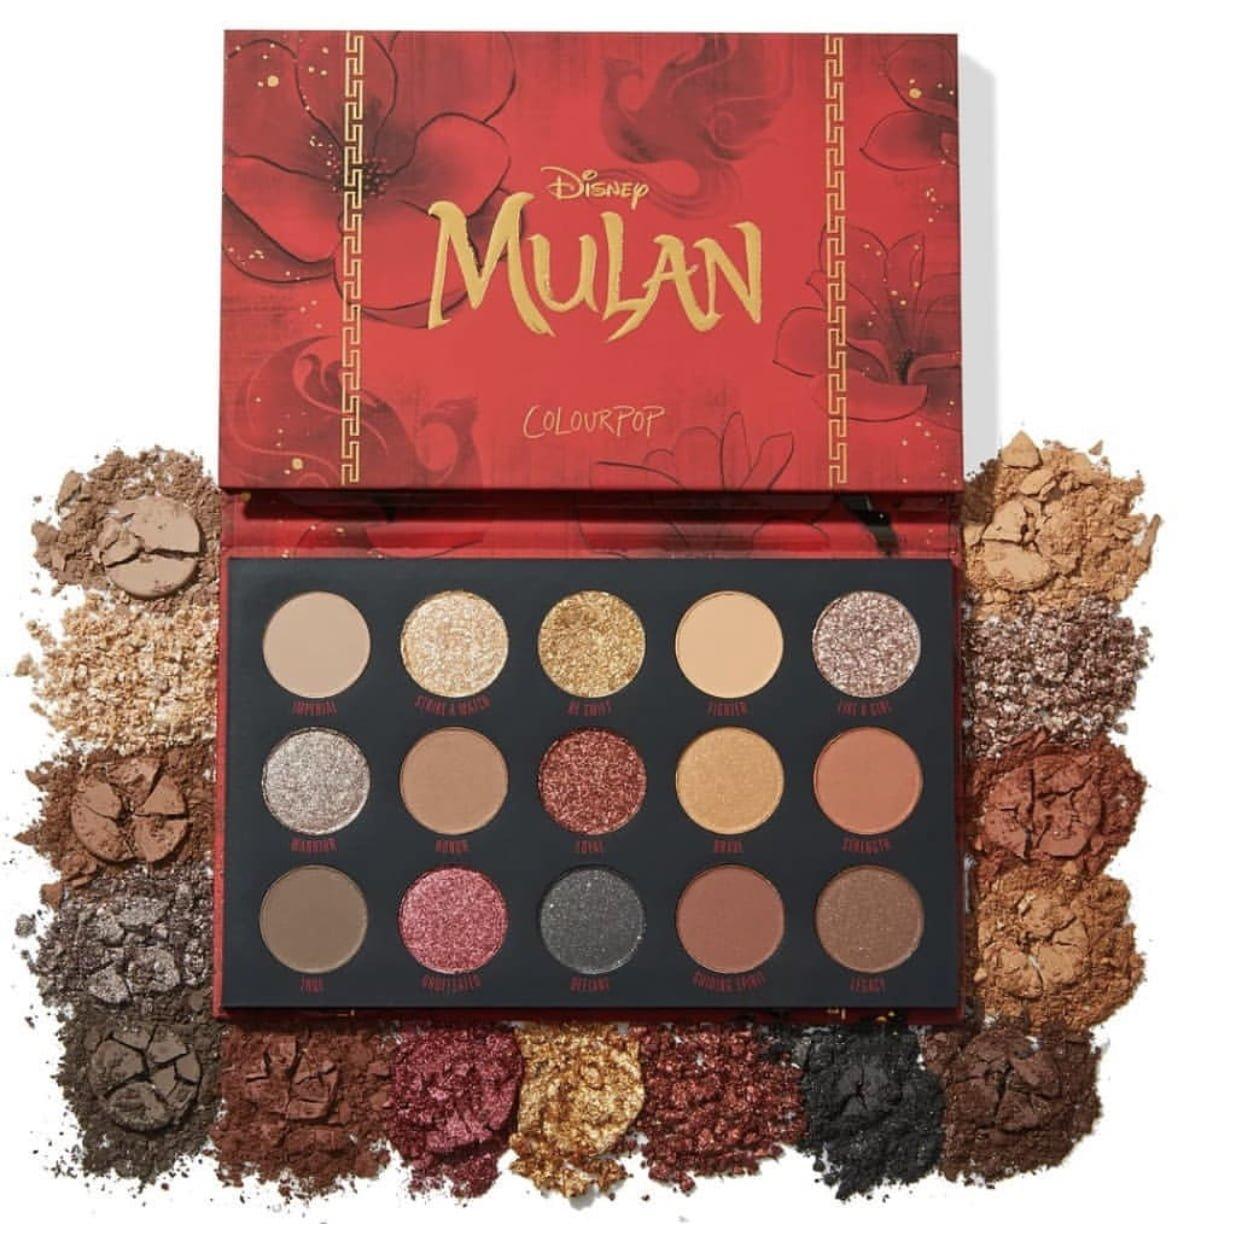 ColourPop Disney Mulan Collection Full Reveal!